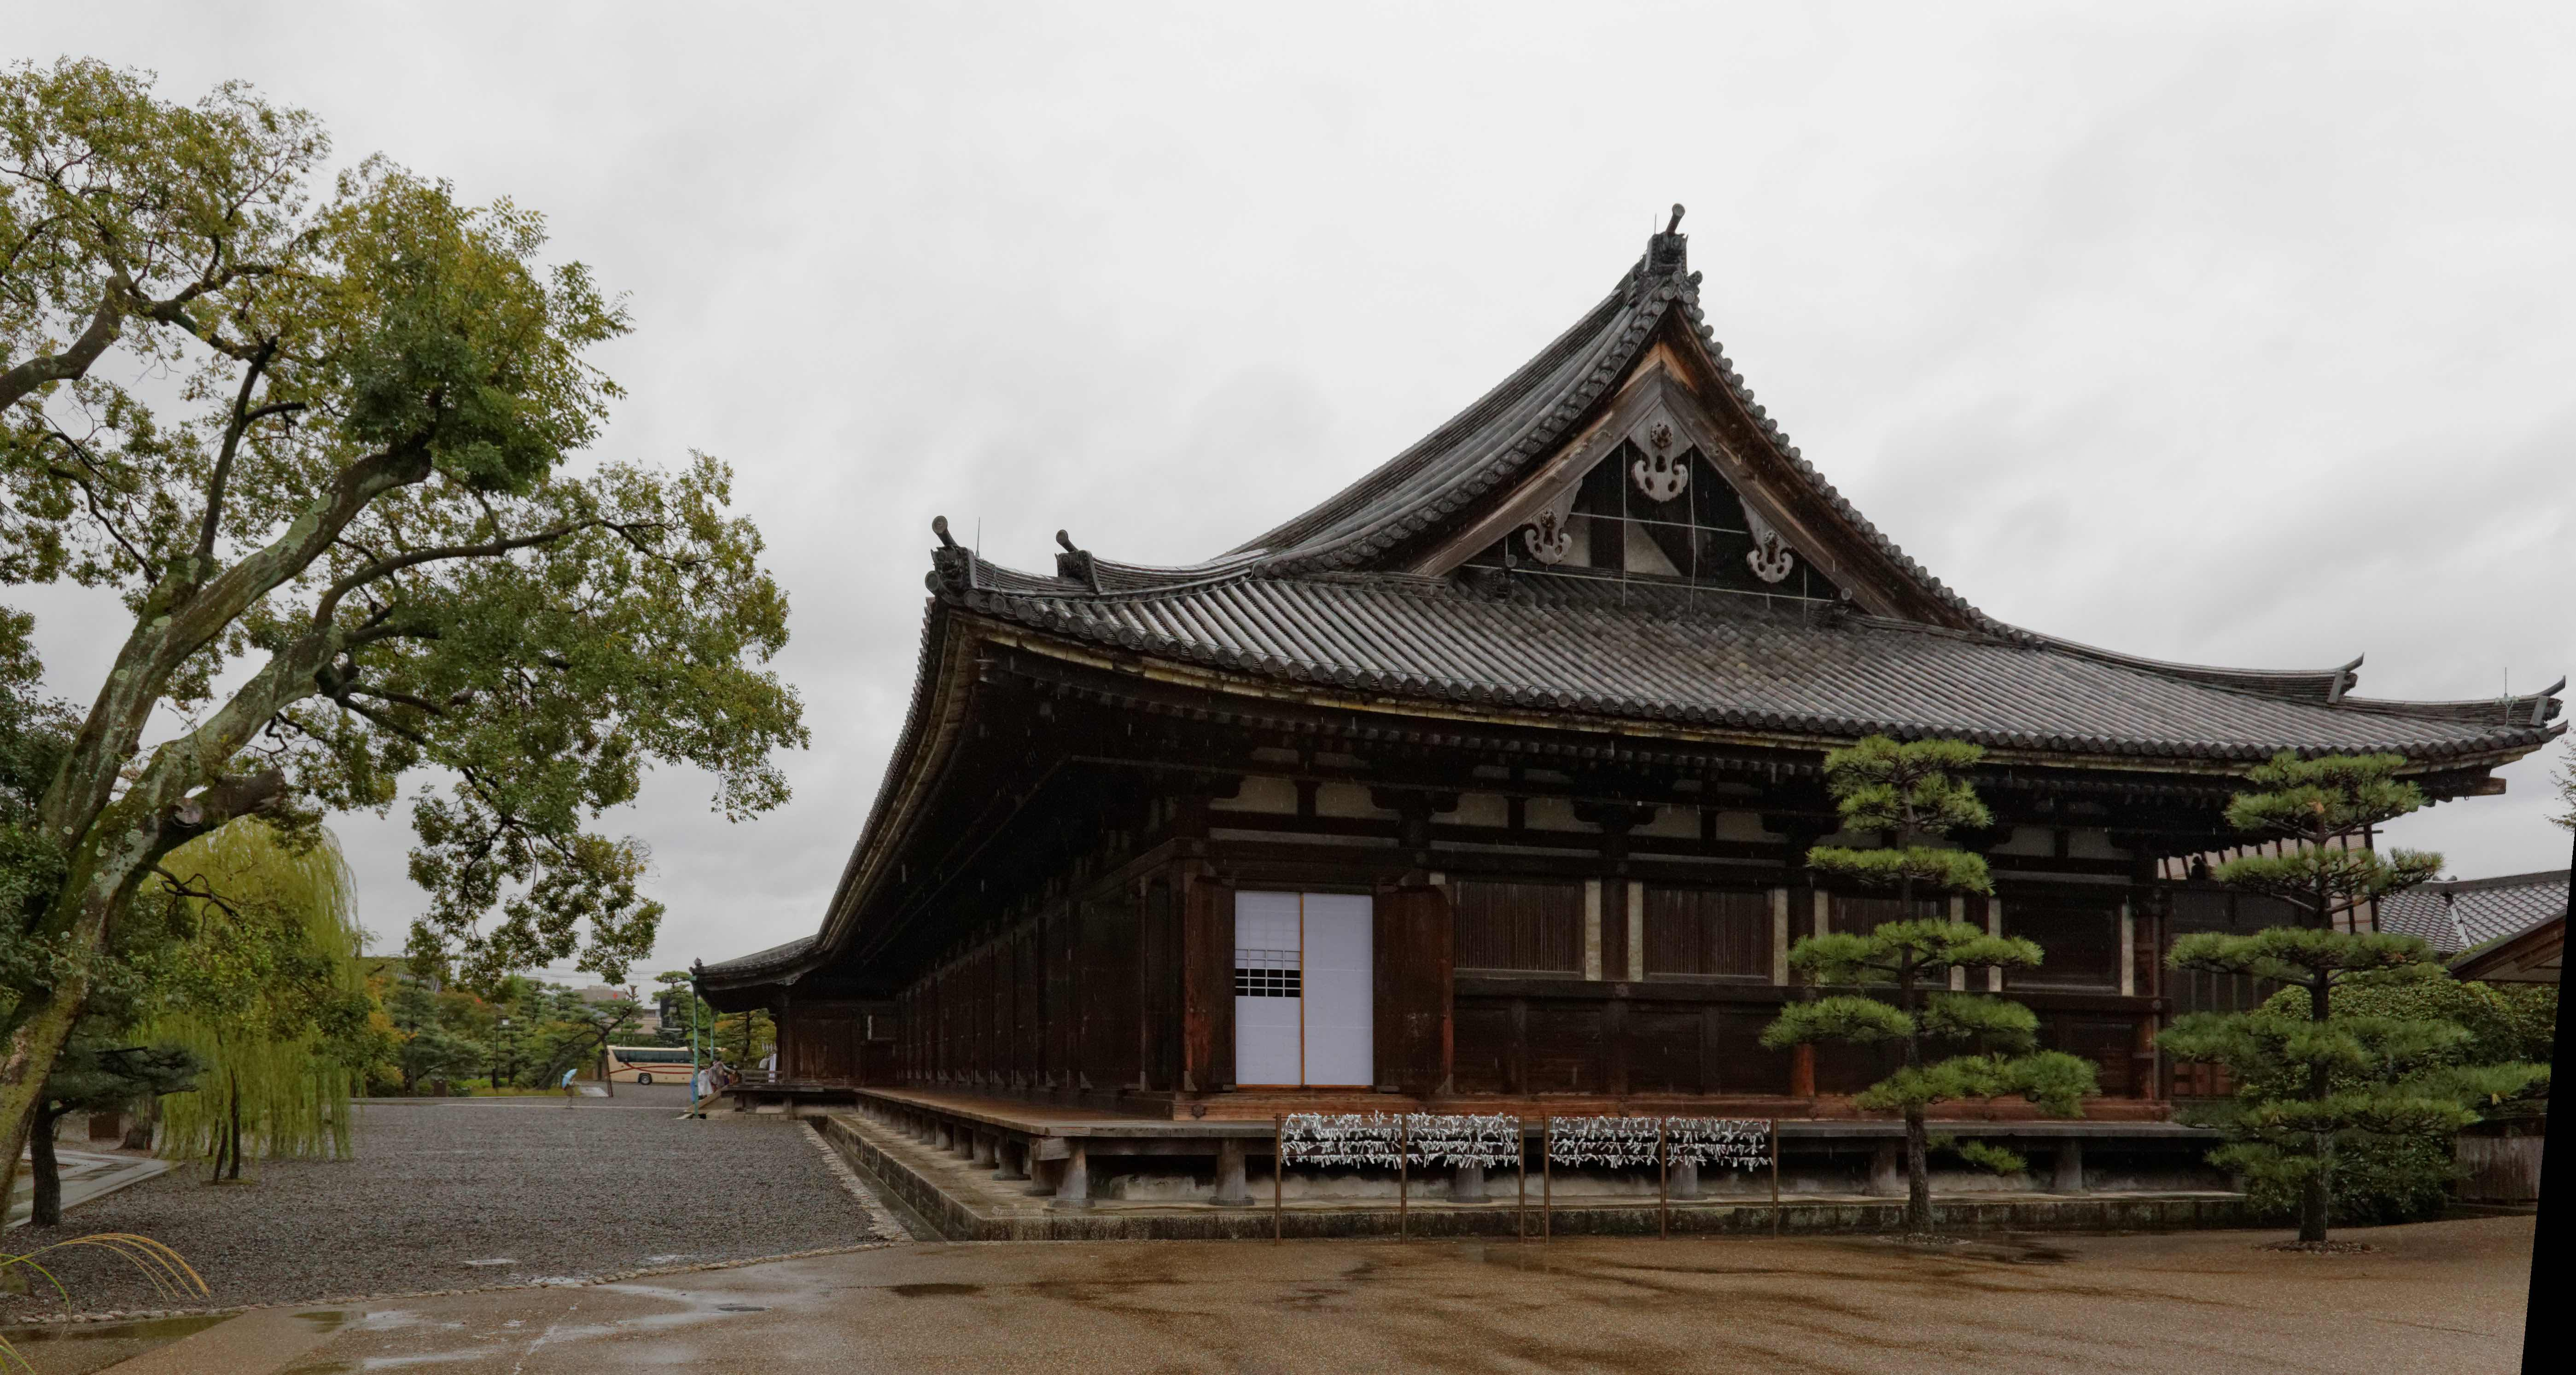 https://www.flickr.com/photos/kimon/